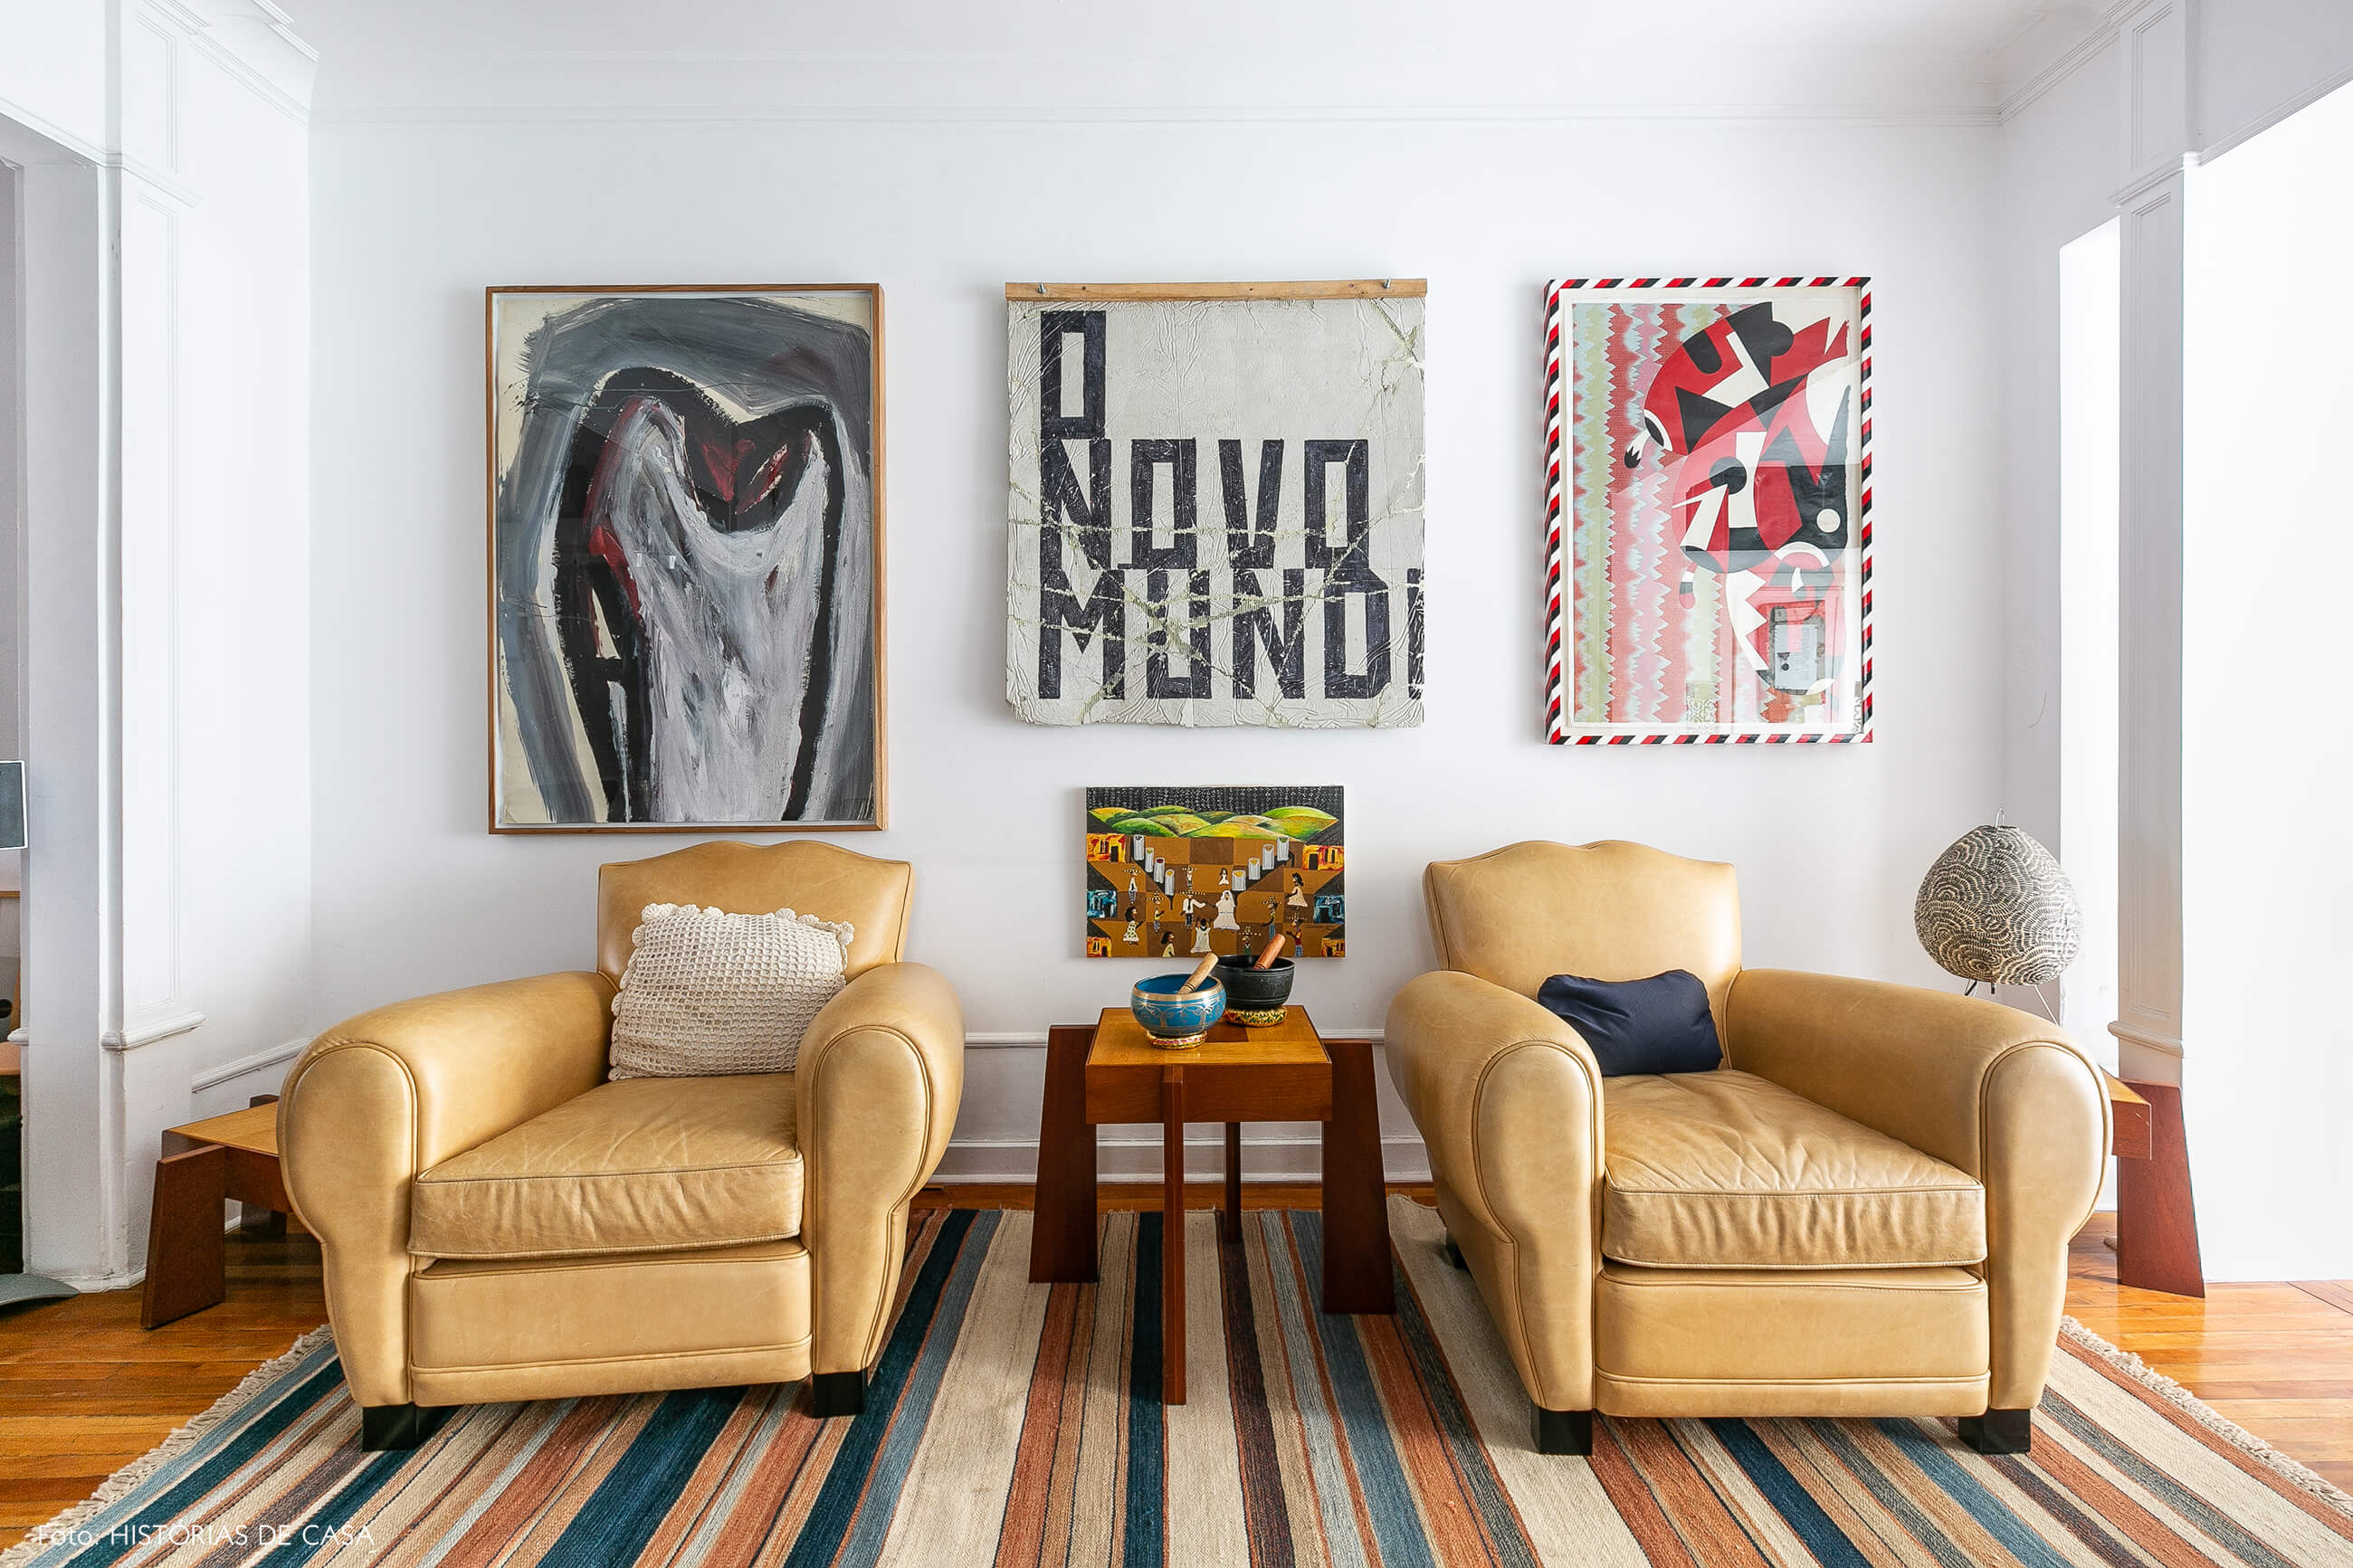 Obras de arte e poltronas de couro